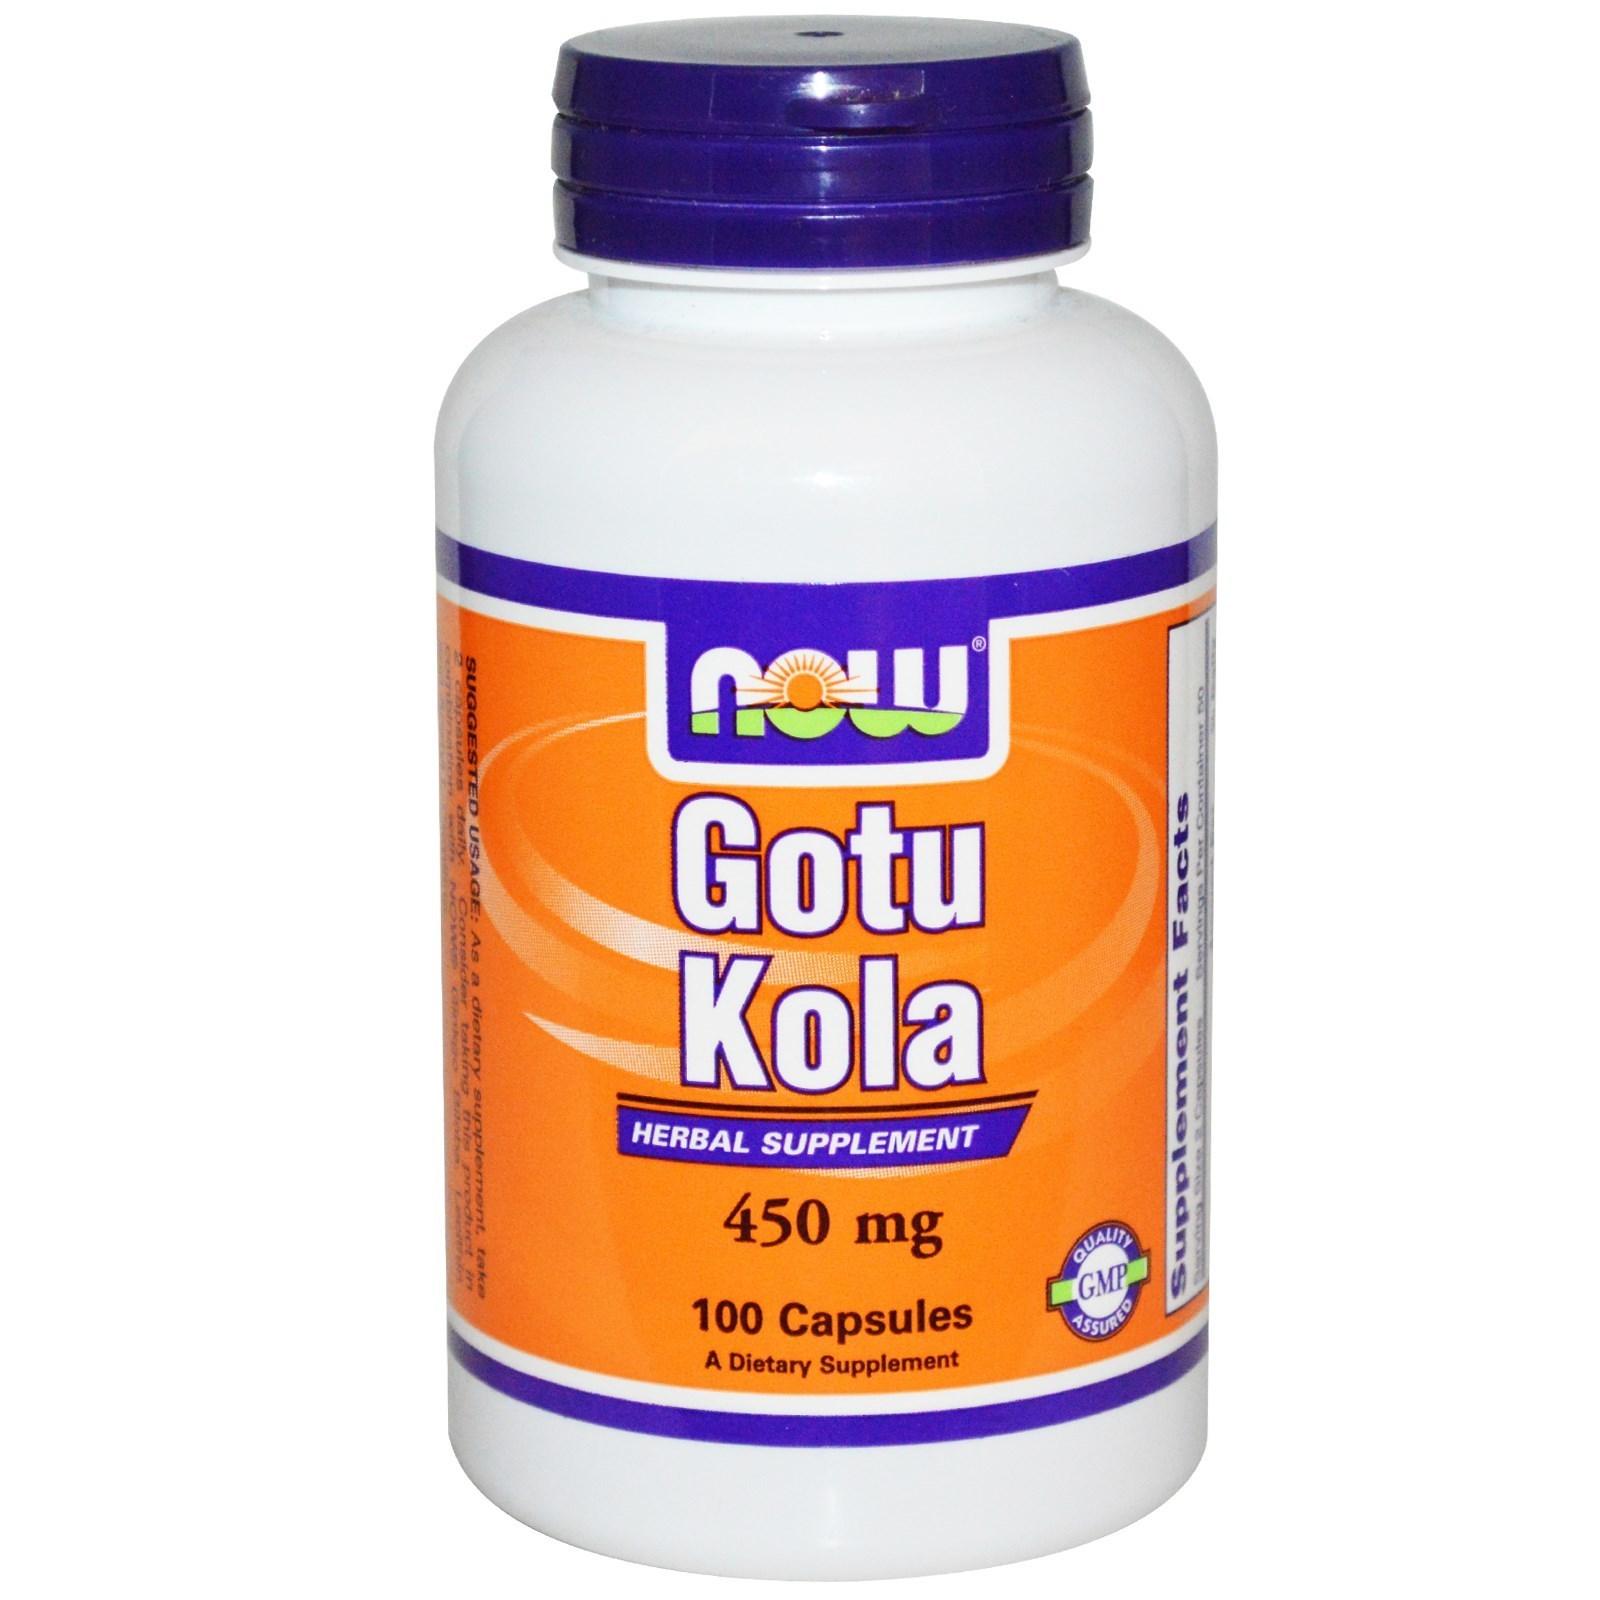 Now Gotu kola 450 mg-100 kapsula 00185